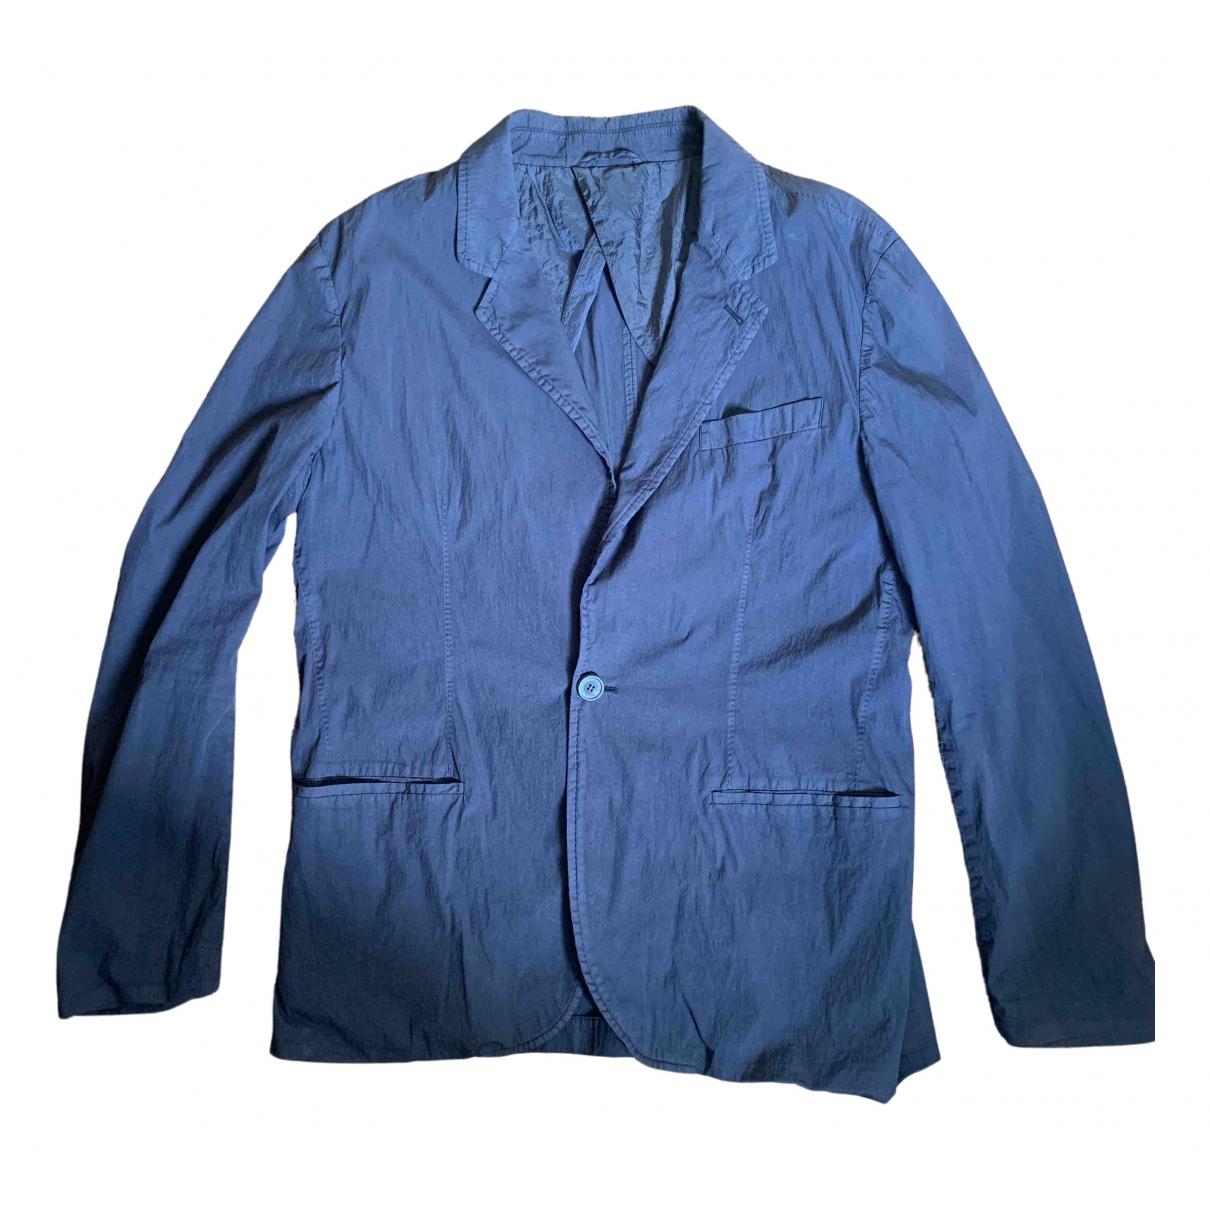 Lanvin \N Jacke in  Blau Baumwolle